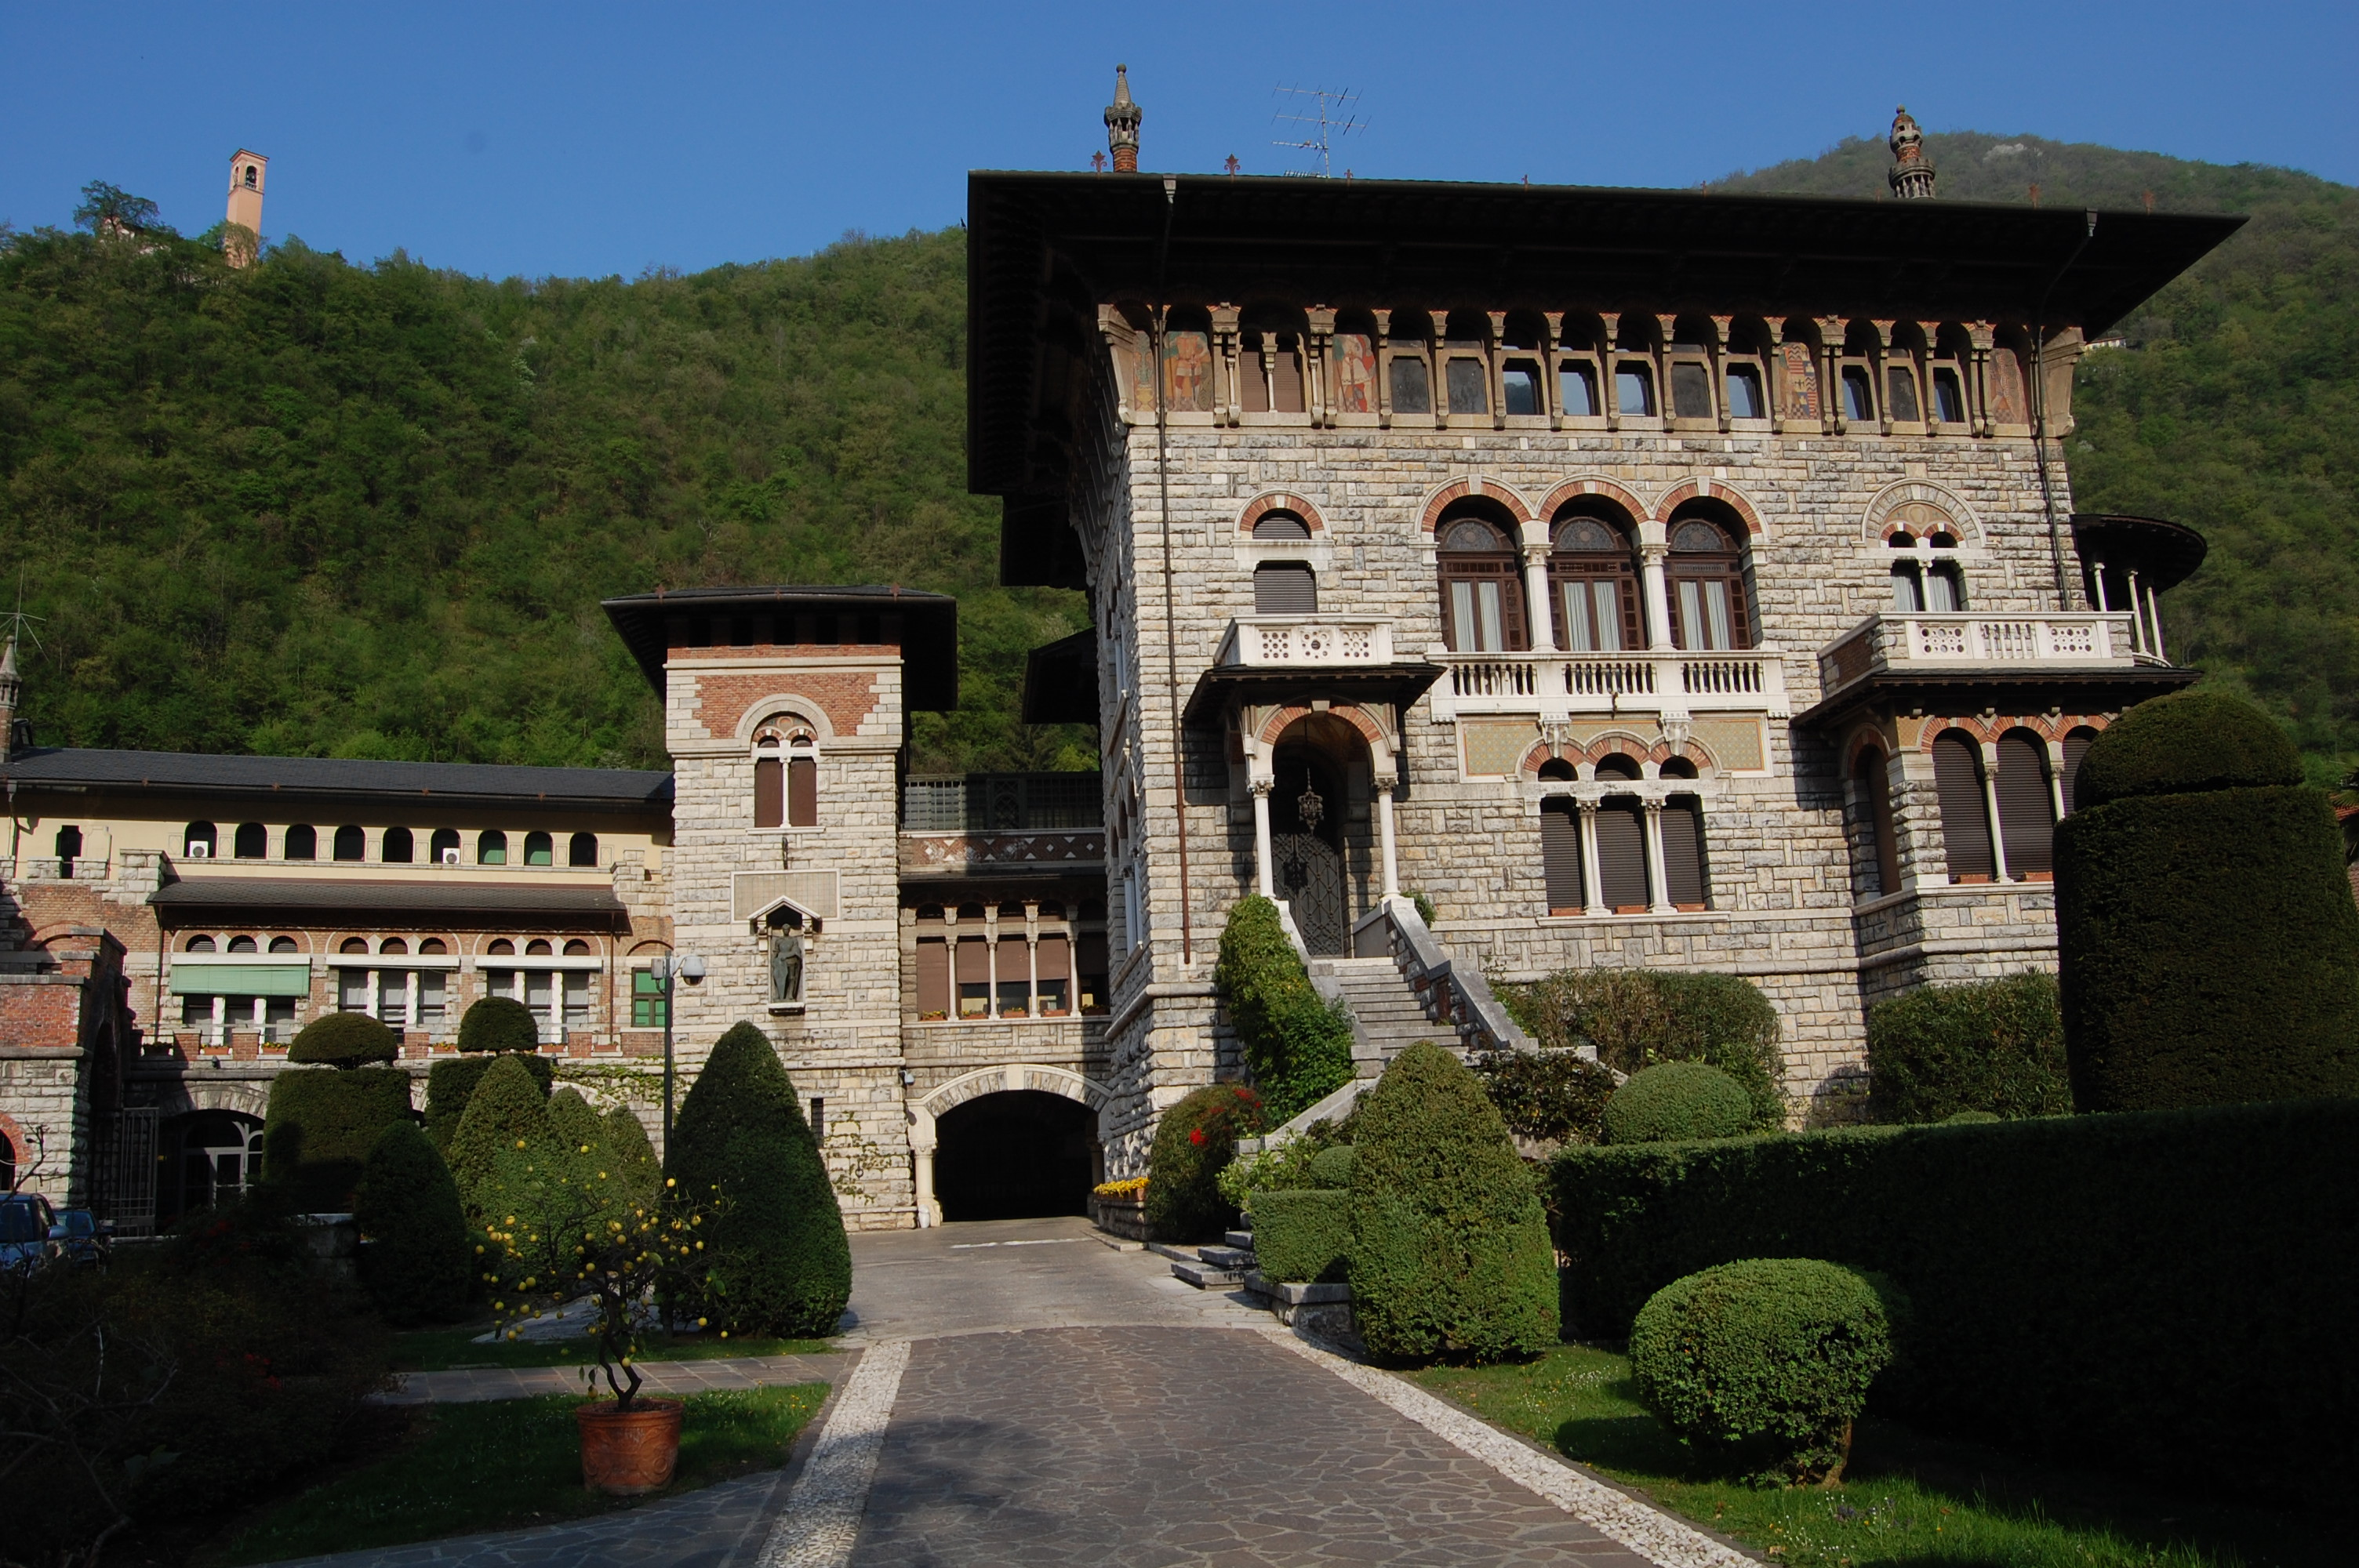 BERETTA, Cavallo & Vinitaly 2011! | The Travelling Gourmet